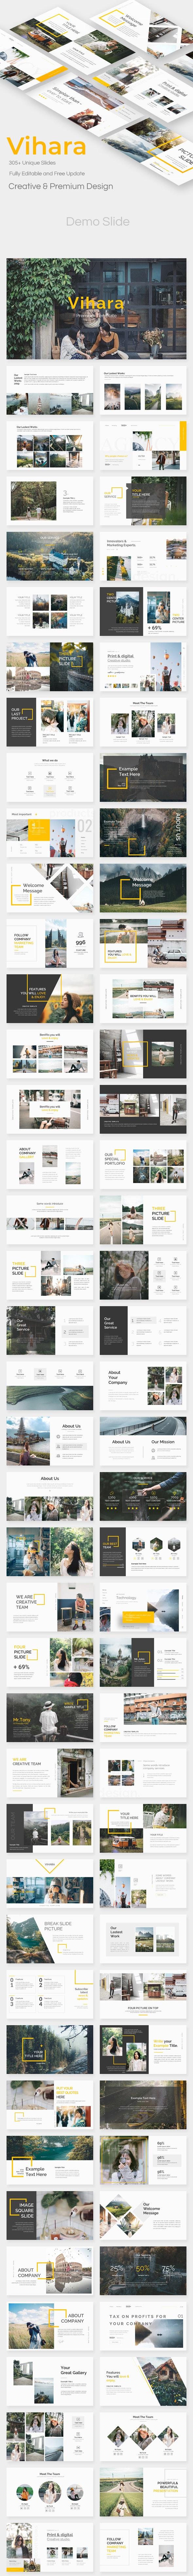 Vihara Premium Powerpoint Template - Creative PowerPoint Templates